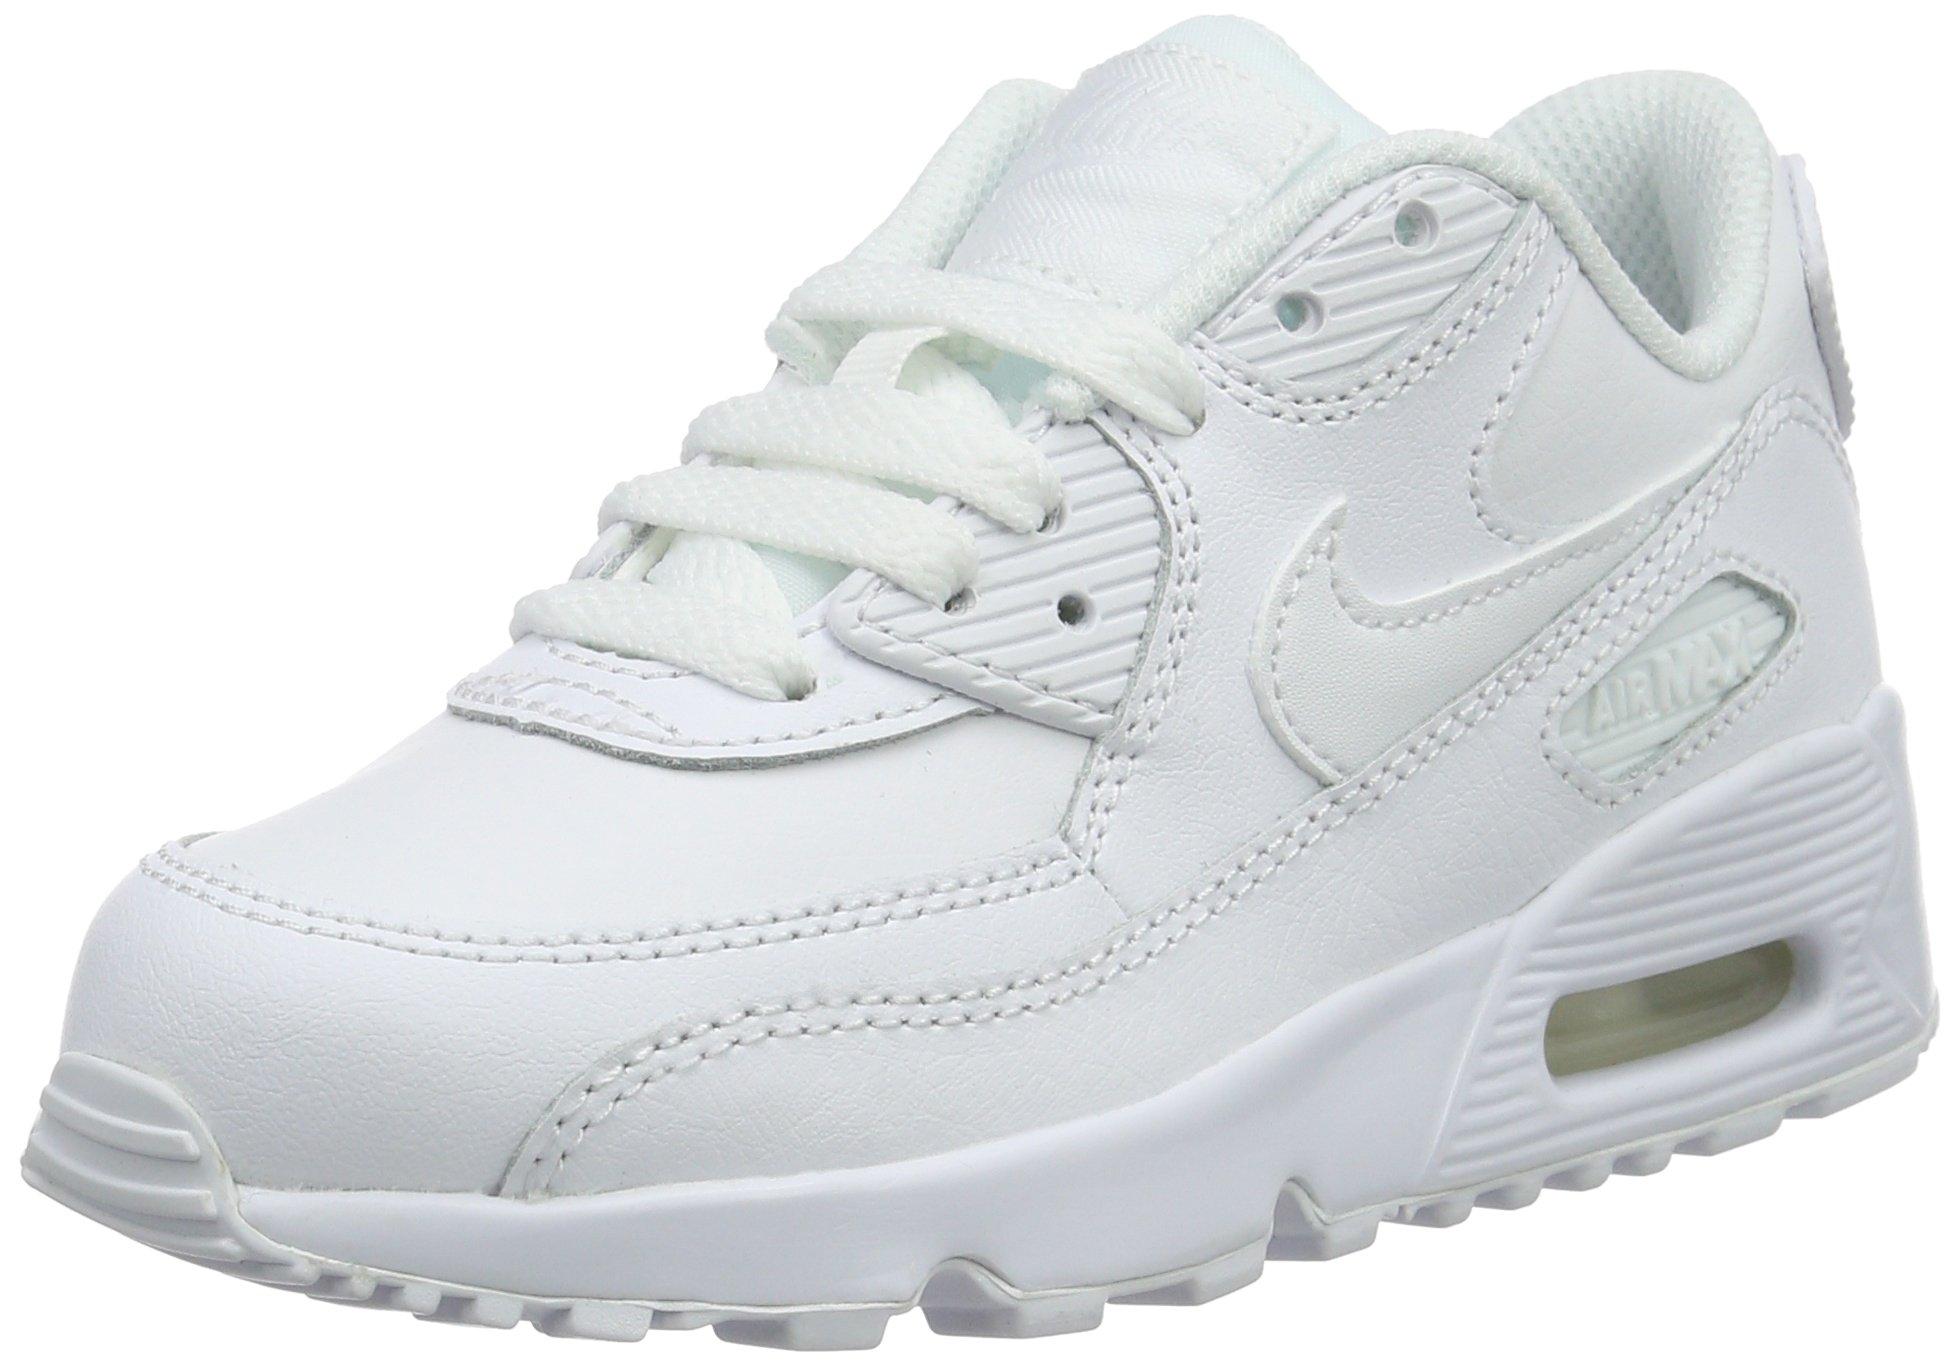 Nike Kids Air Max 90 LTR (PS) White/White Running Shoe 2 Kids US